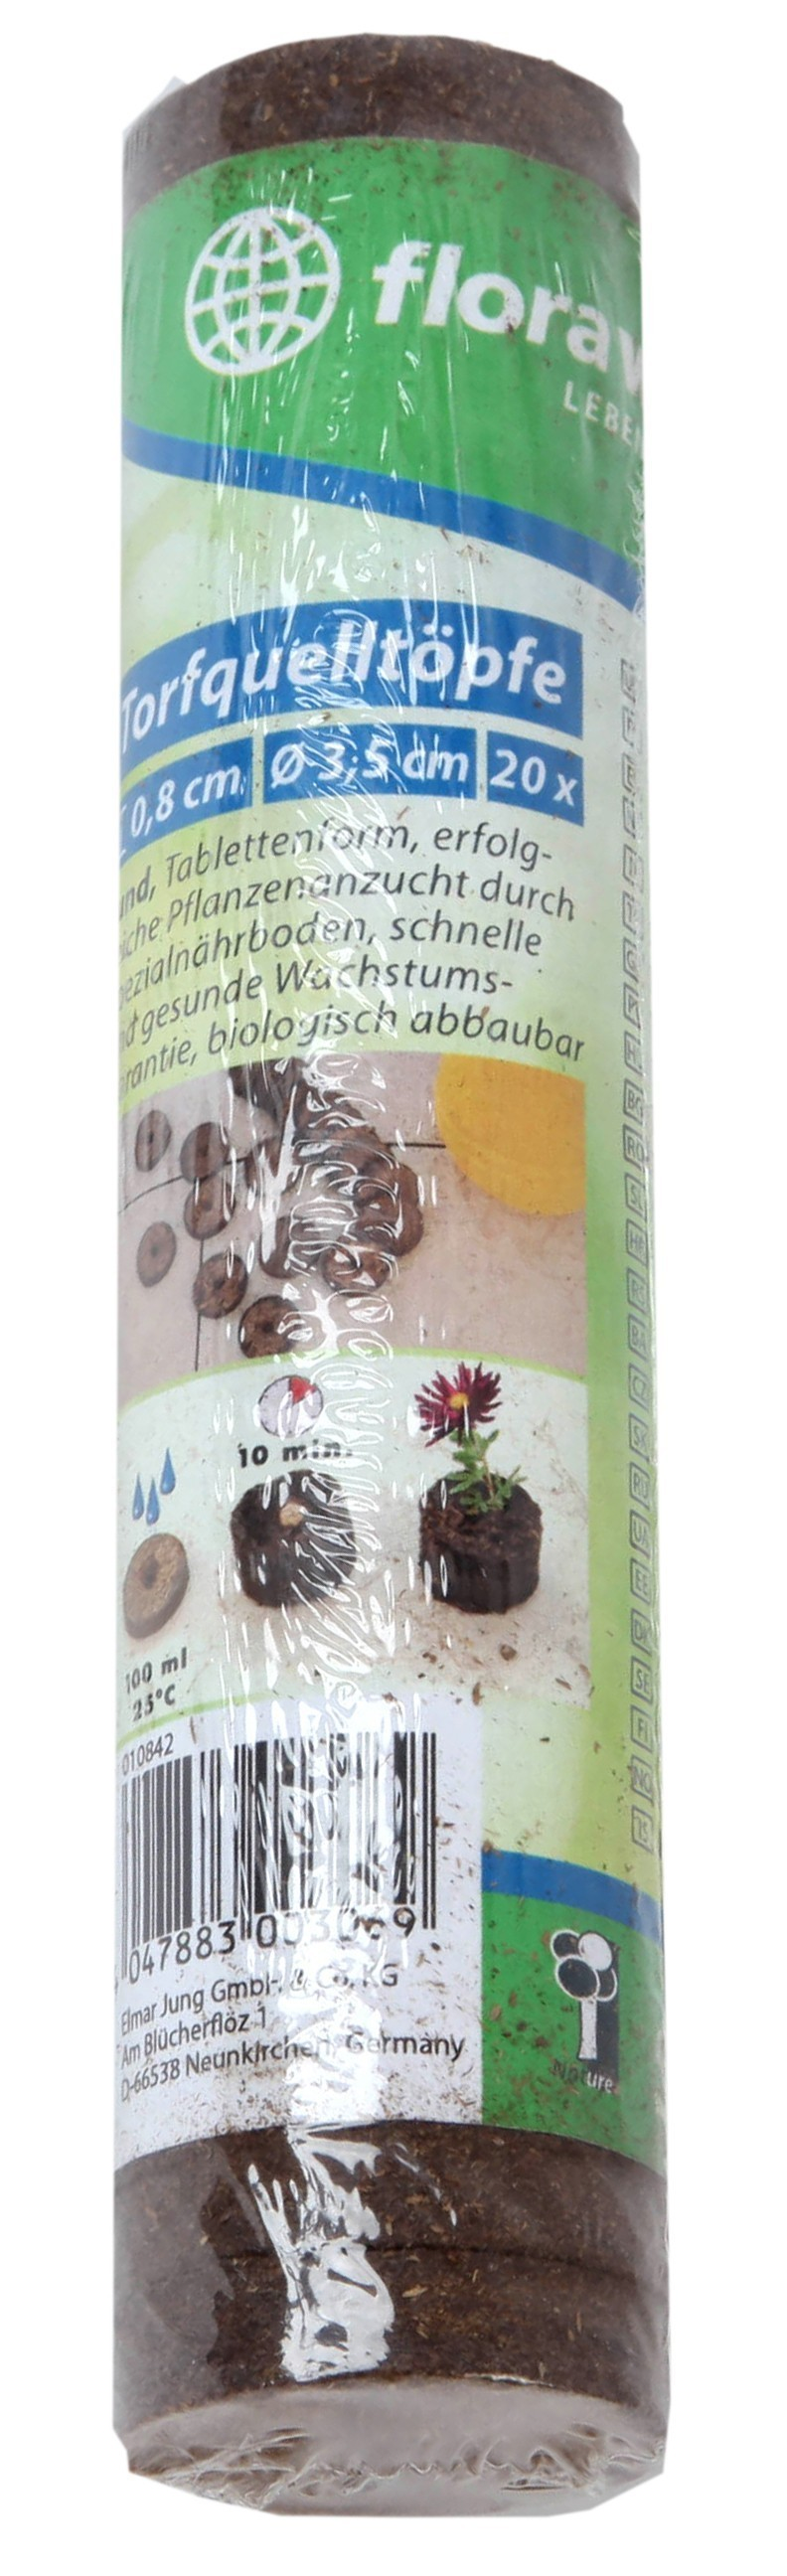 Torfquelltöpfe / Torfquelltabs classic floraworld Ø3,5cm 20 Stück Bild 1